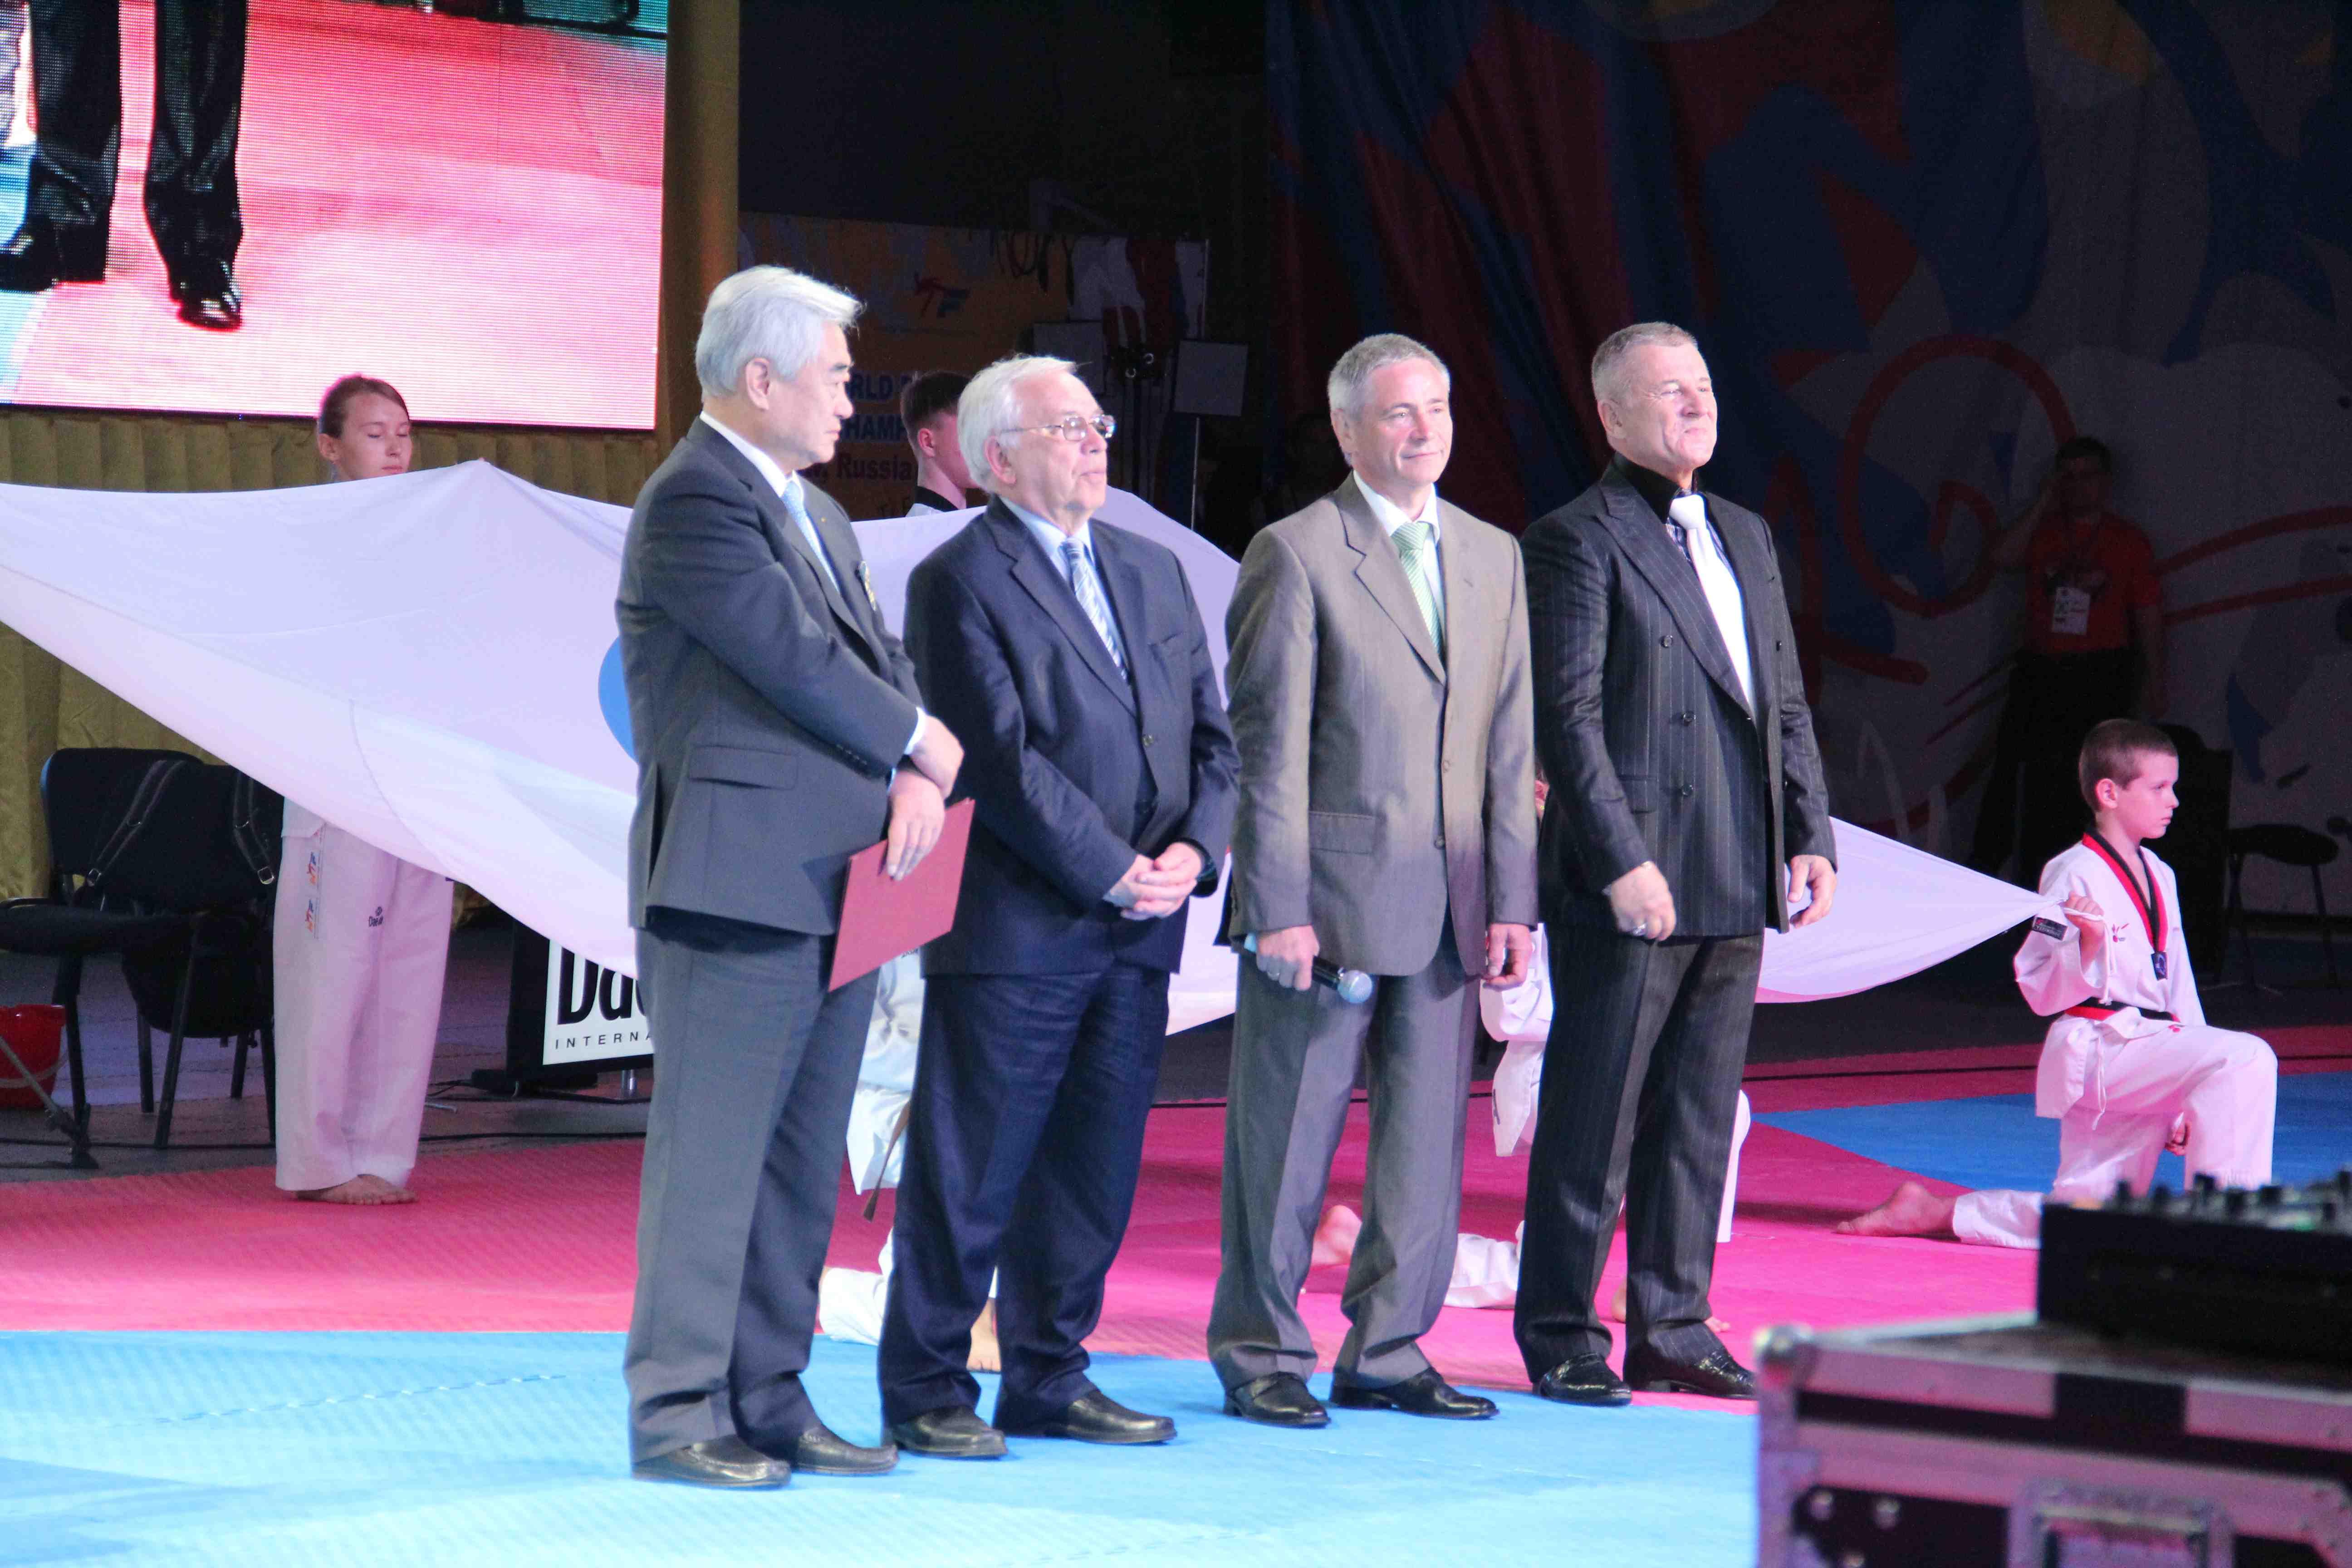 В.П. Лукин и П.А. Рожков во Дворце спорта «Динамо» приняли участие в церемонии открытия 5 чемпионата мира по пара-тхэквондо